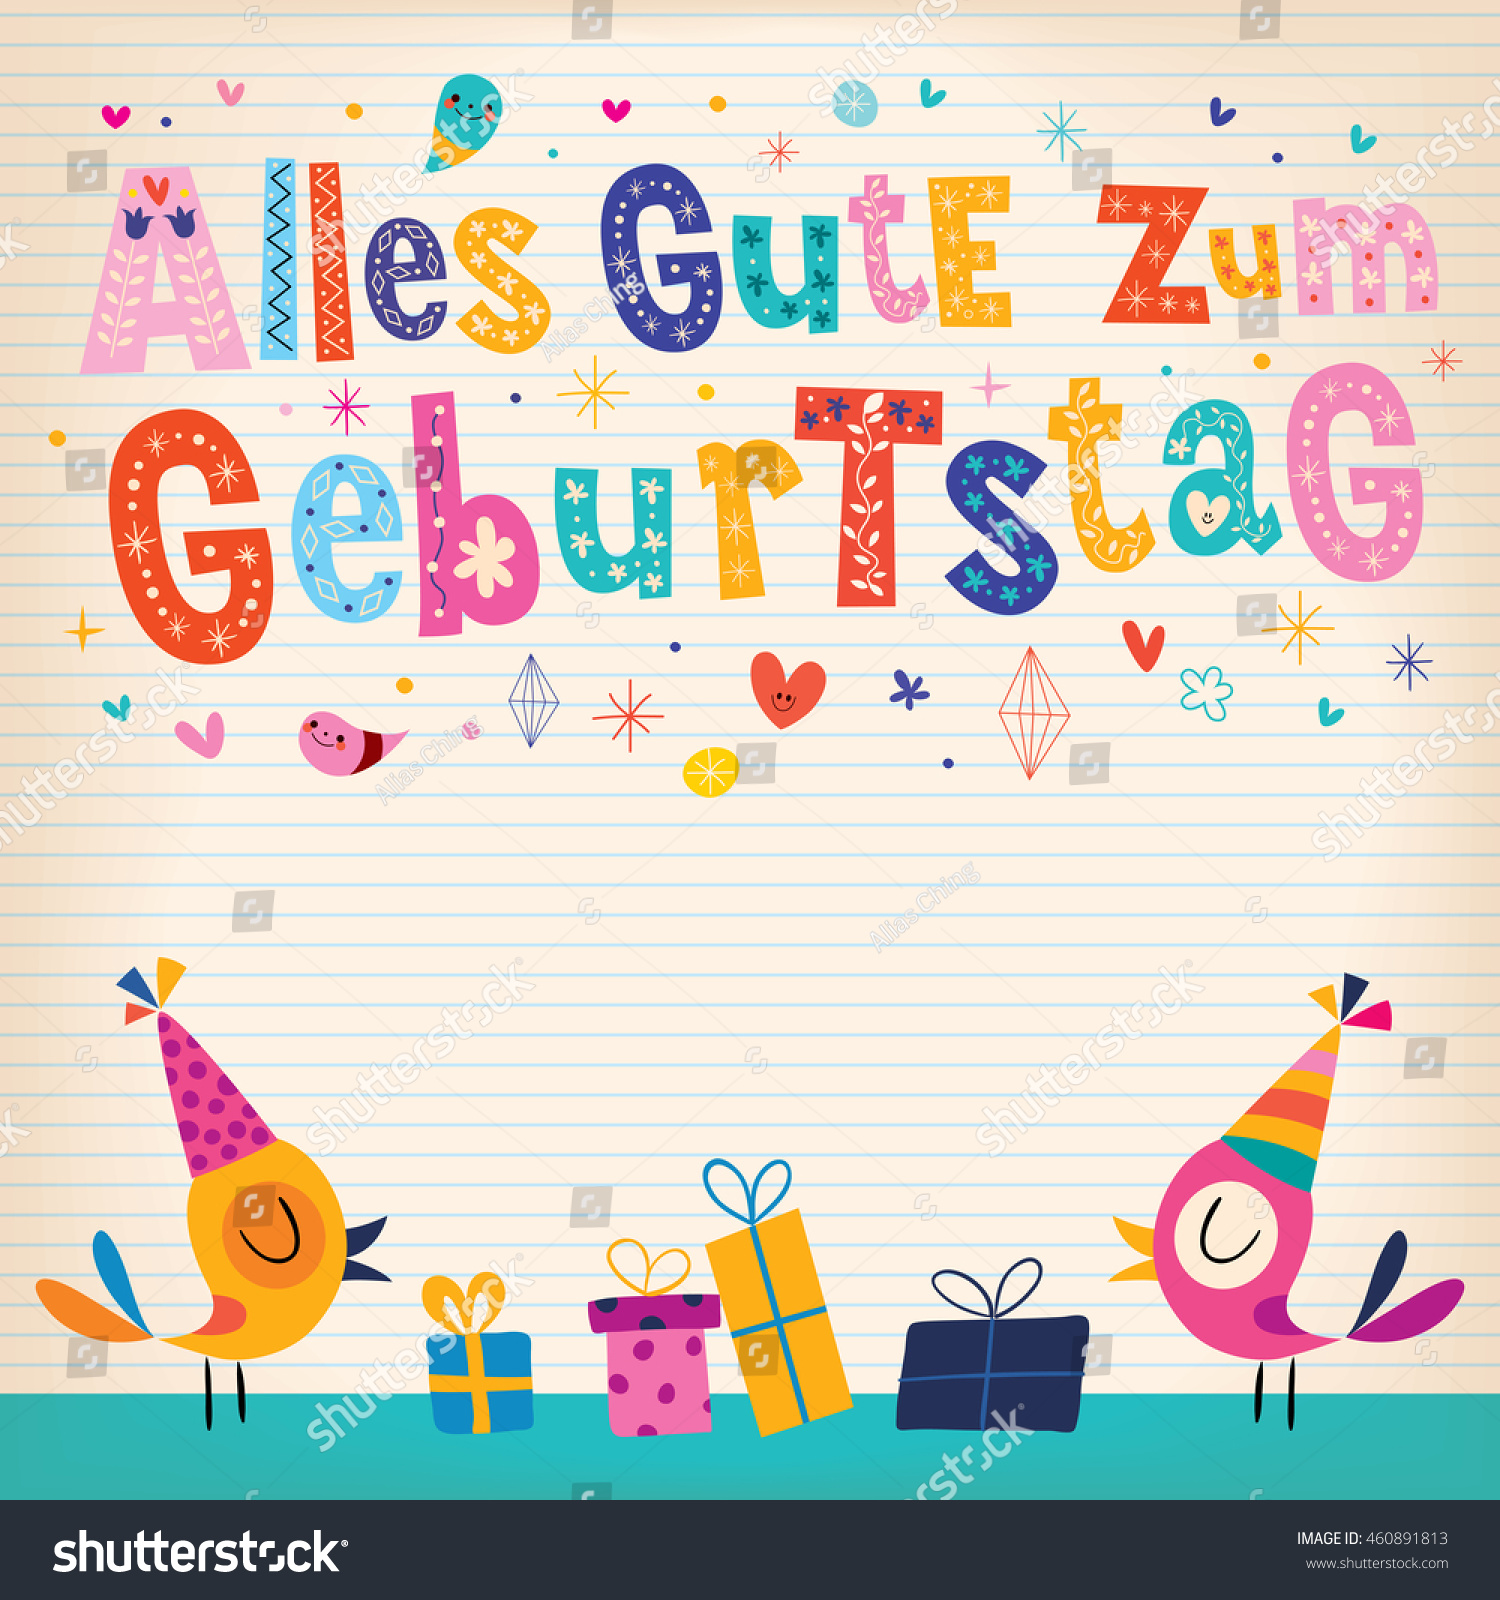 Alles Gute Zum Geburtstag Happy Birthday Vector 460891813 – Birthday Card in German